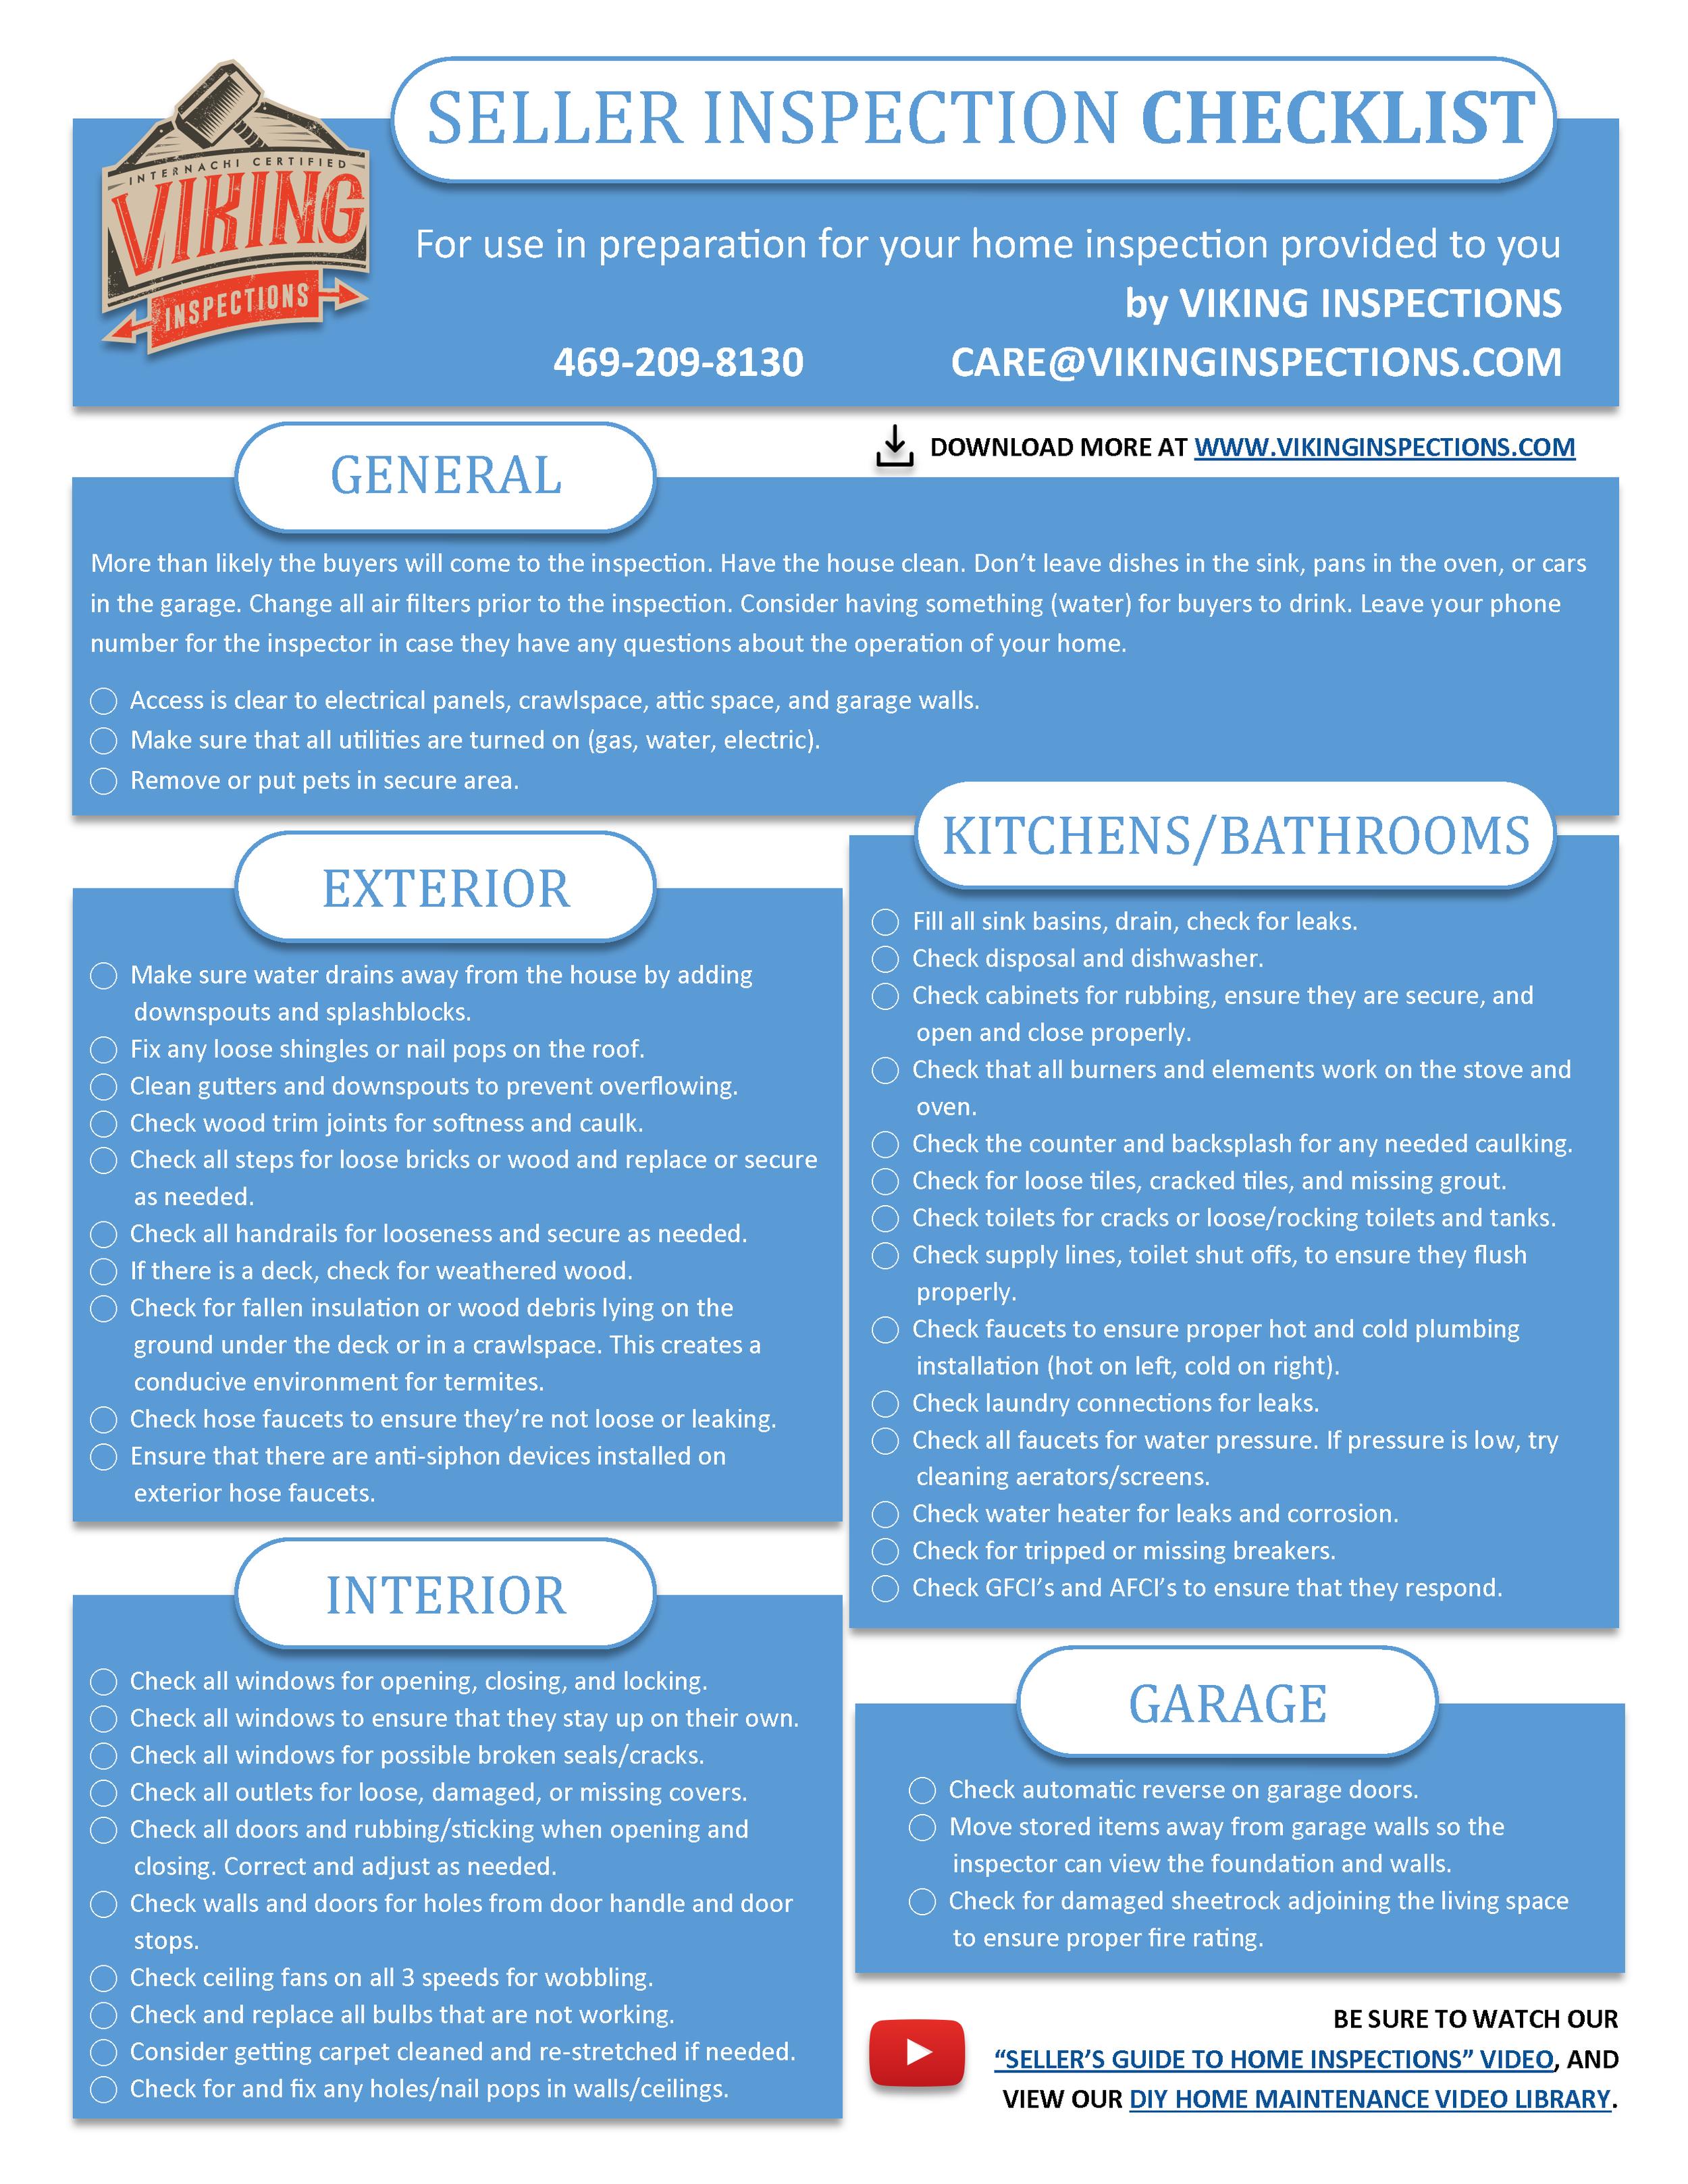 Seller Inspection Checklist.png